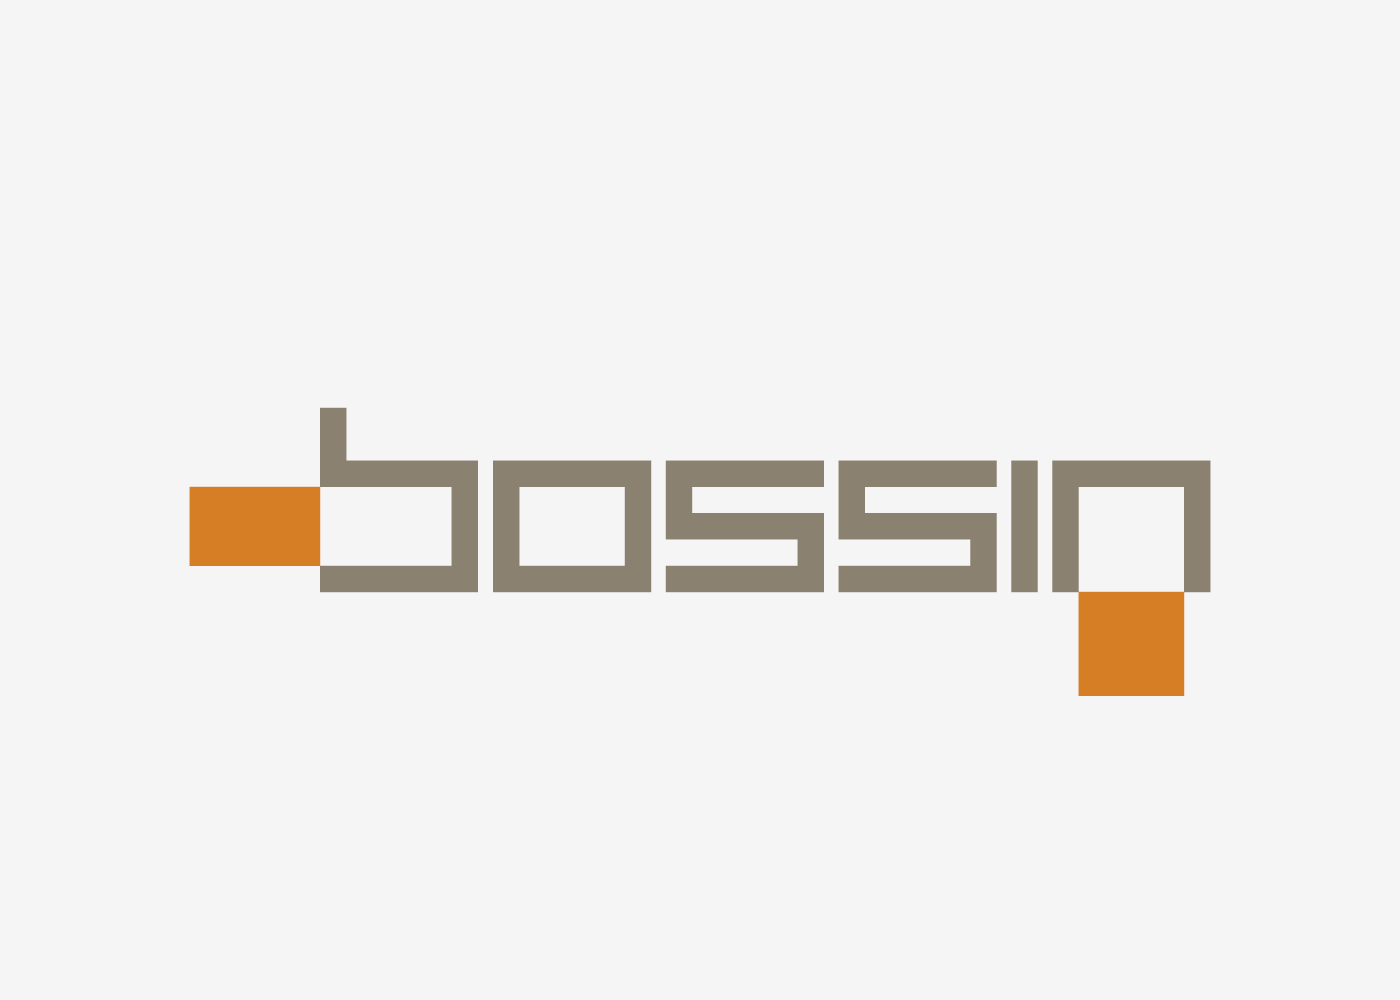 The new visual identity of the company